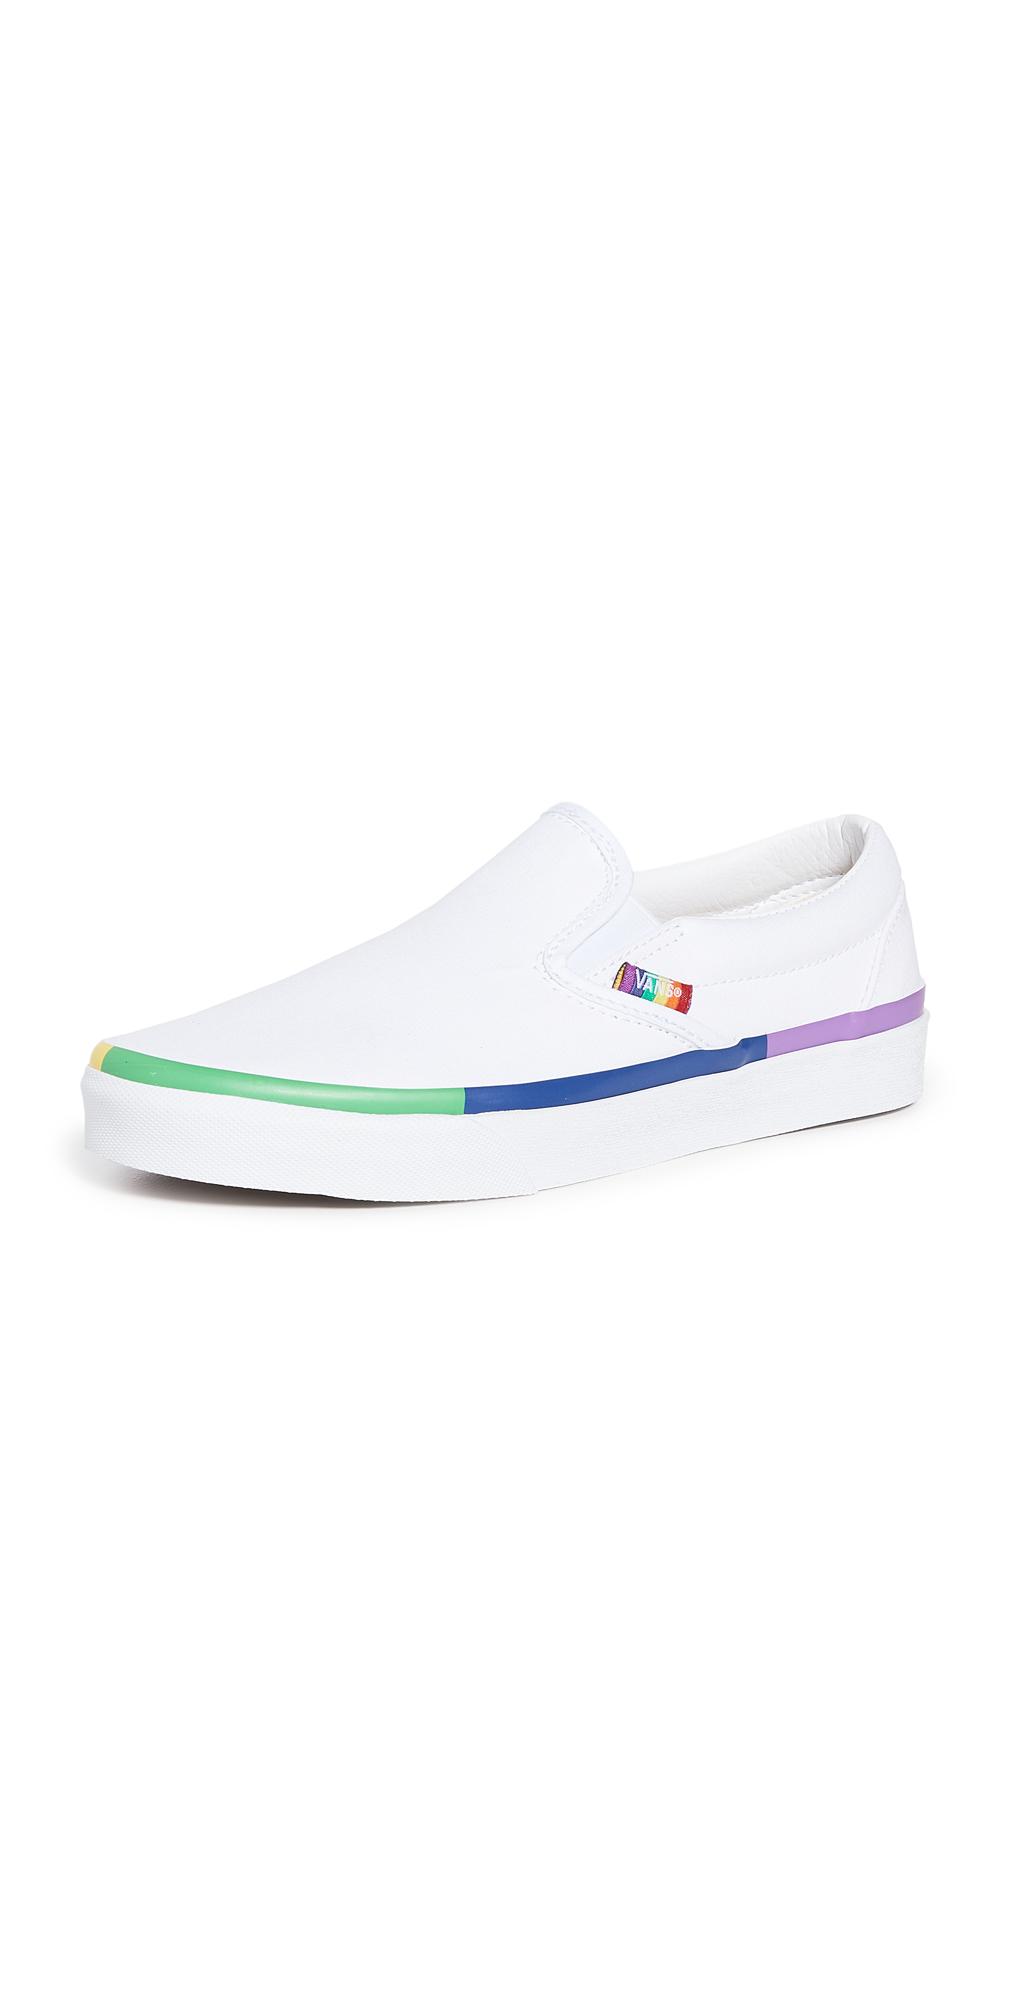 Vans UA Classic Slip-On Sneakers